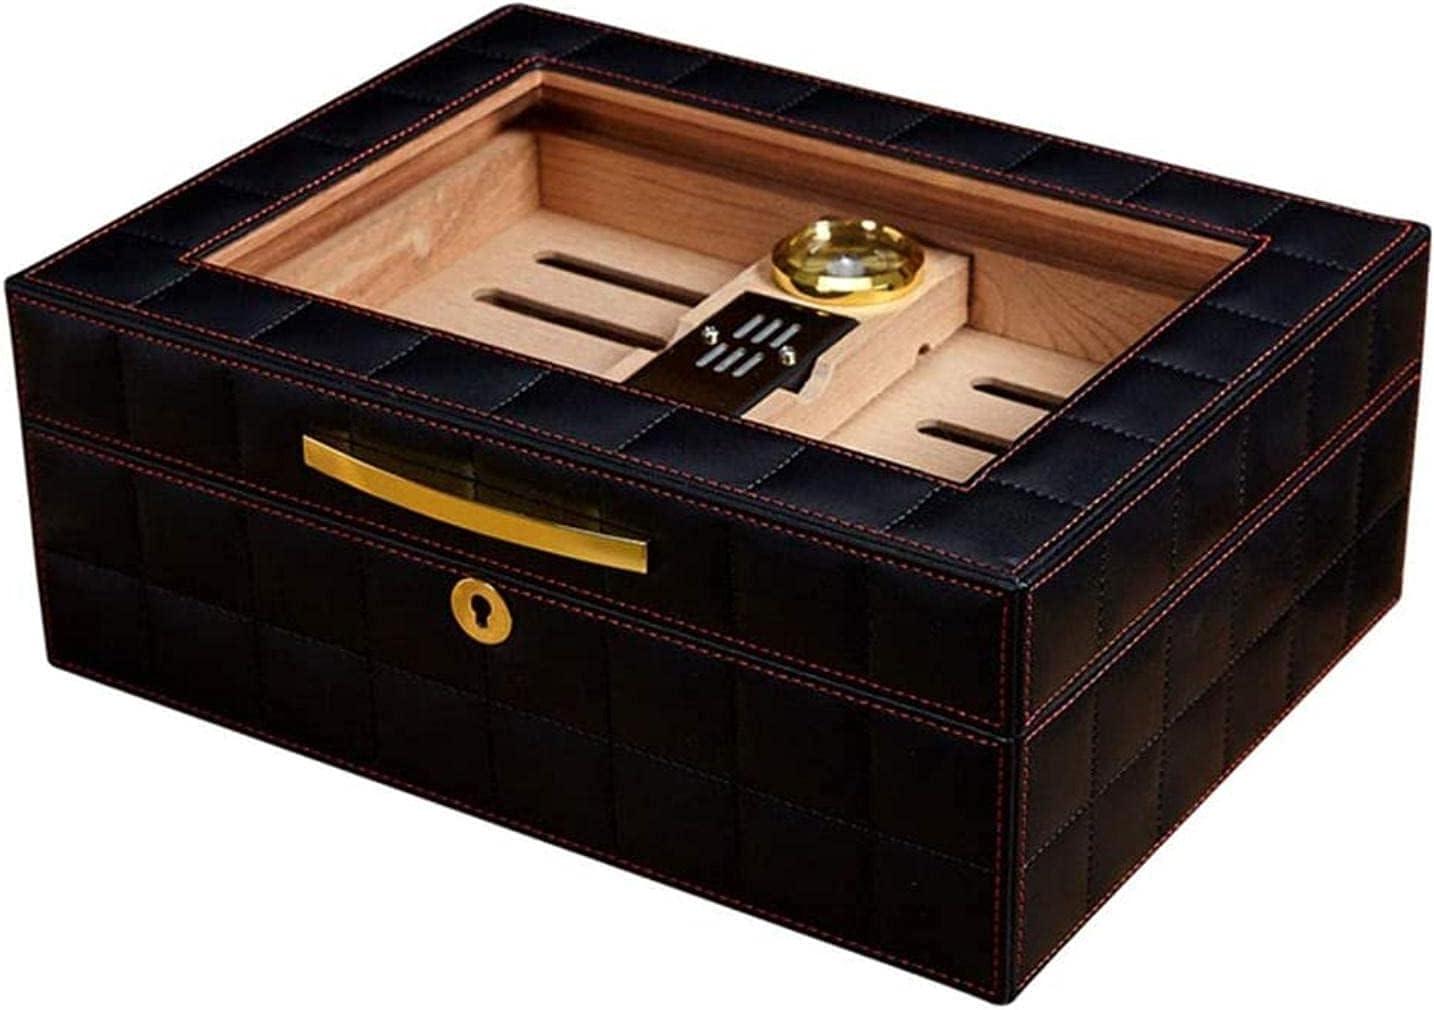 Ultra-Cheap Deals ZHJBD Smoking Set Cigar Accessories Humidor Travel Japan's largest assortment wit Box